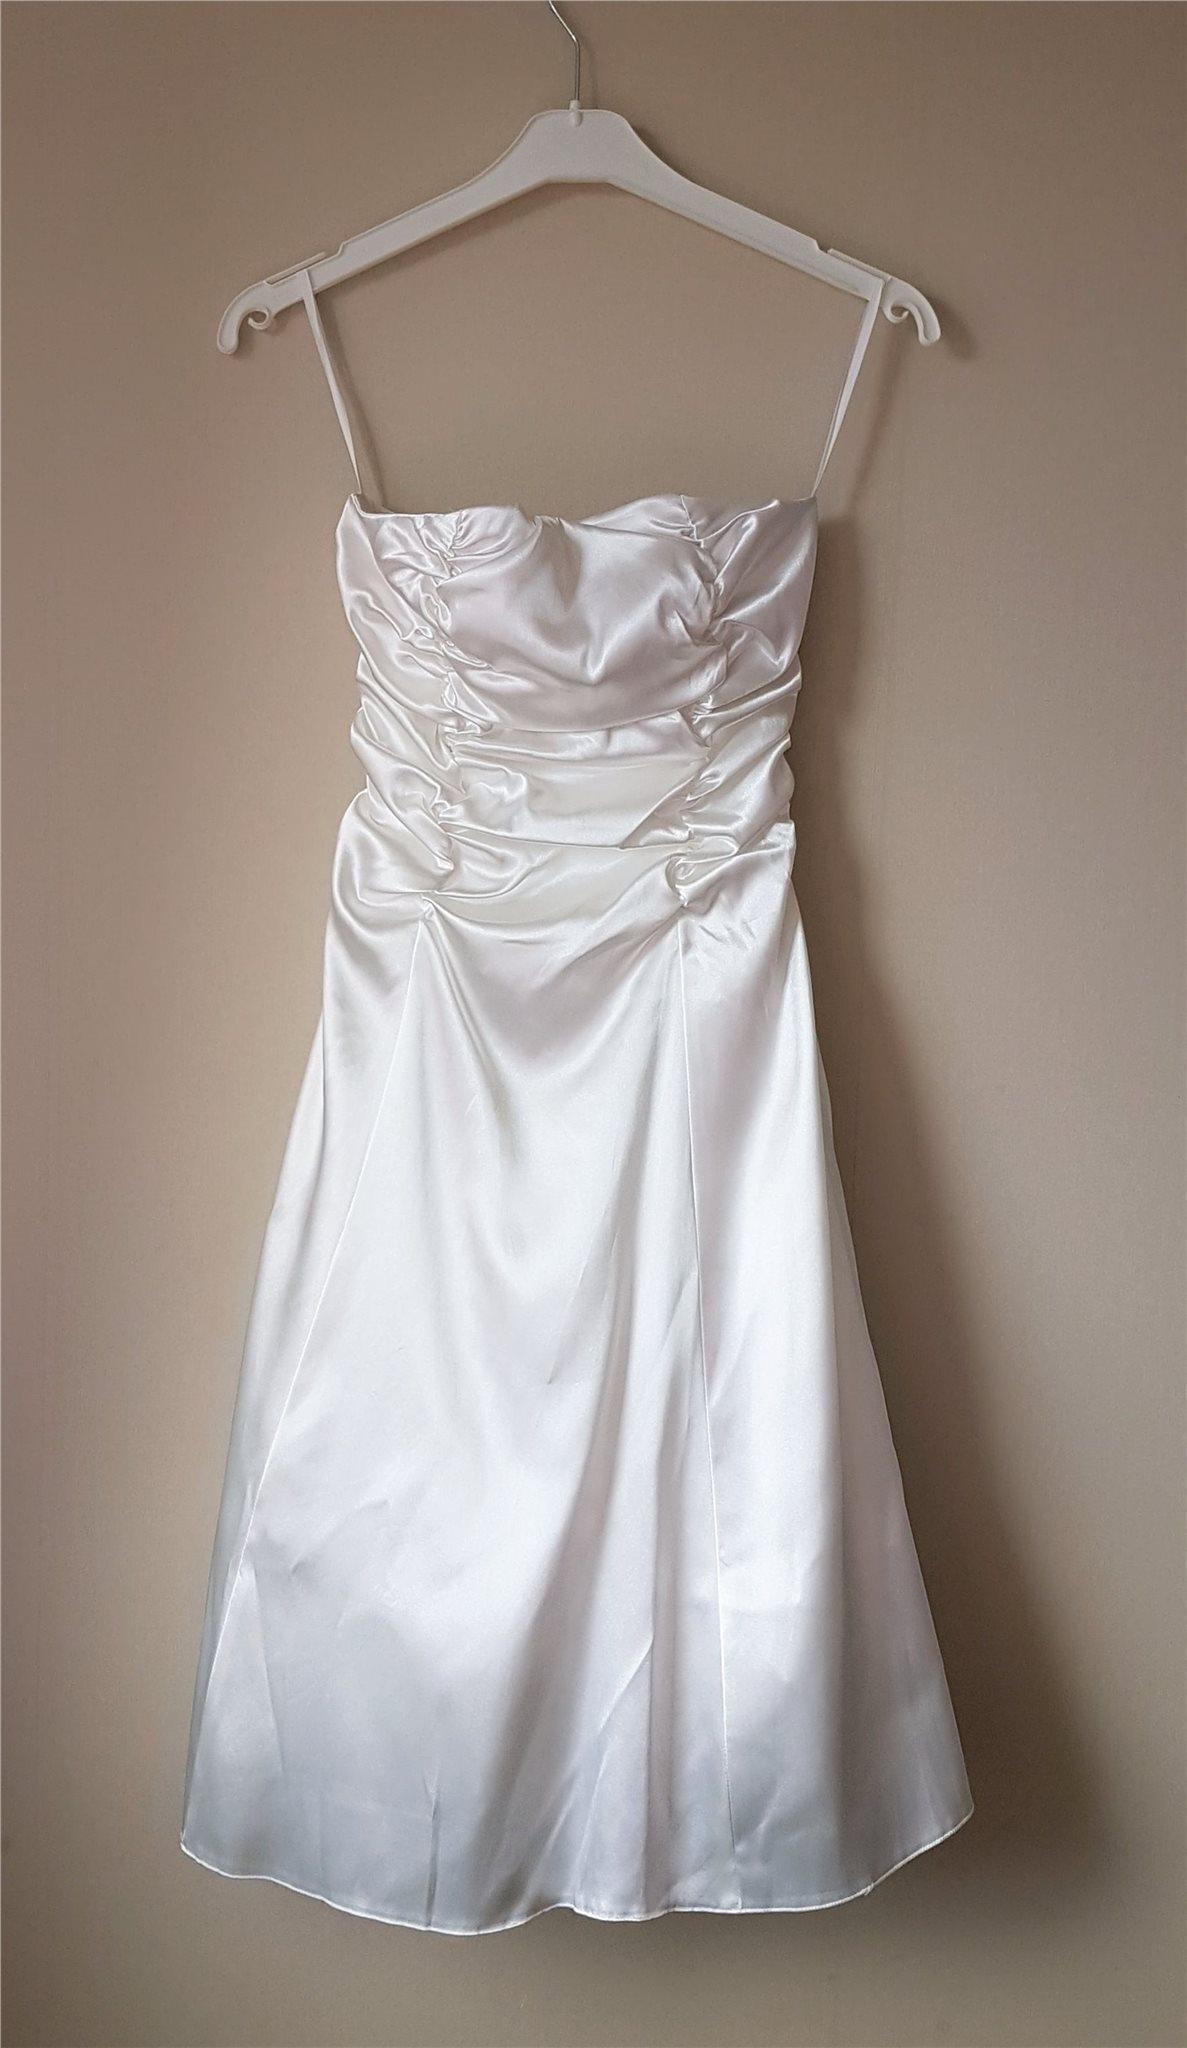 5d277116d4c5 Vit klänning, Nyskick, stl M (S-L), Bröllop, Fe.. (331186190) ᐈ Köp ...